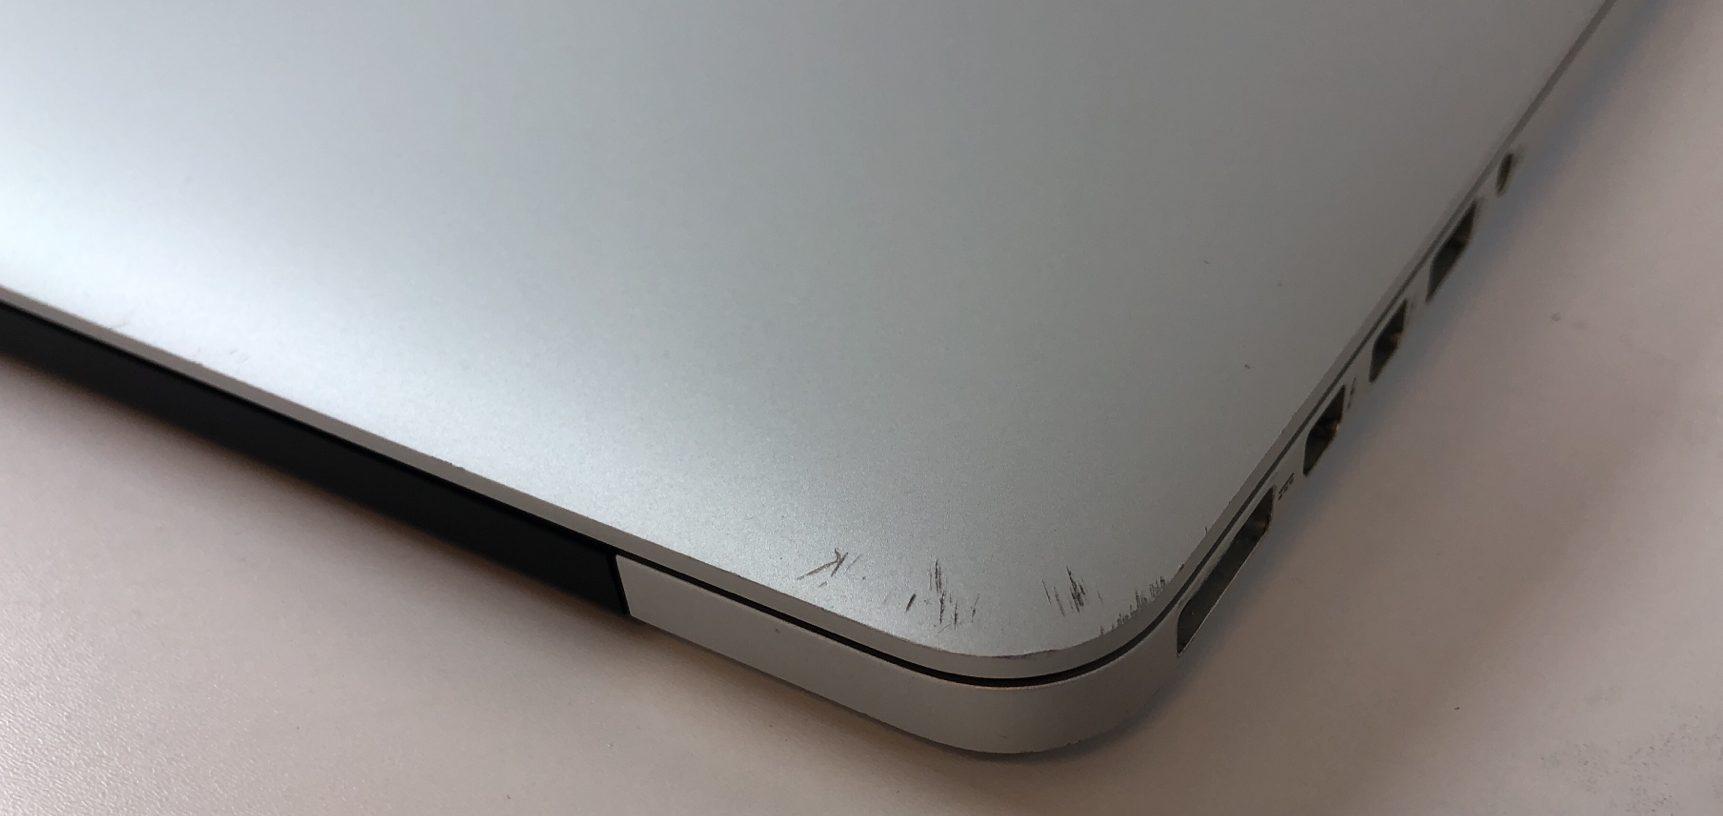 "MacBook Pro Retina 15"" Late 2013 (Intel Quad-Core i7 2.0 GHz 16 GB RAM 256 GB SSD), Intel Quad-Core i7 2.0 GHz, 16 GB RAM, 256 GB SSD, Afbeelding 4"